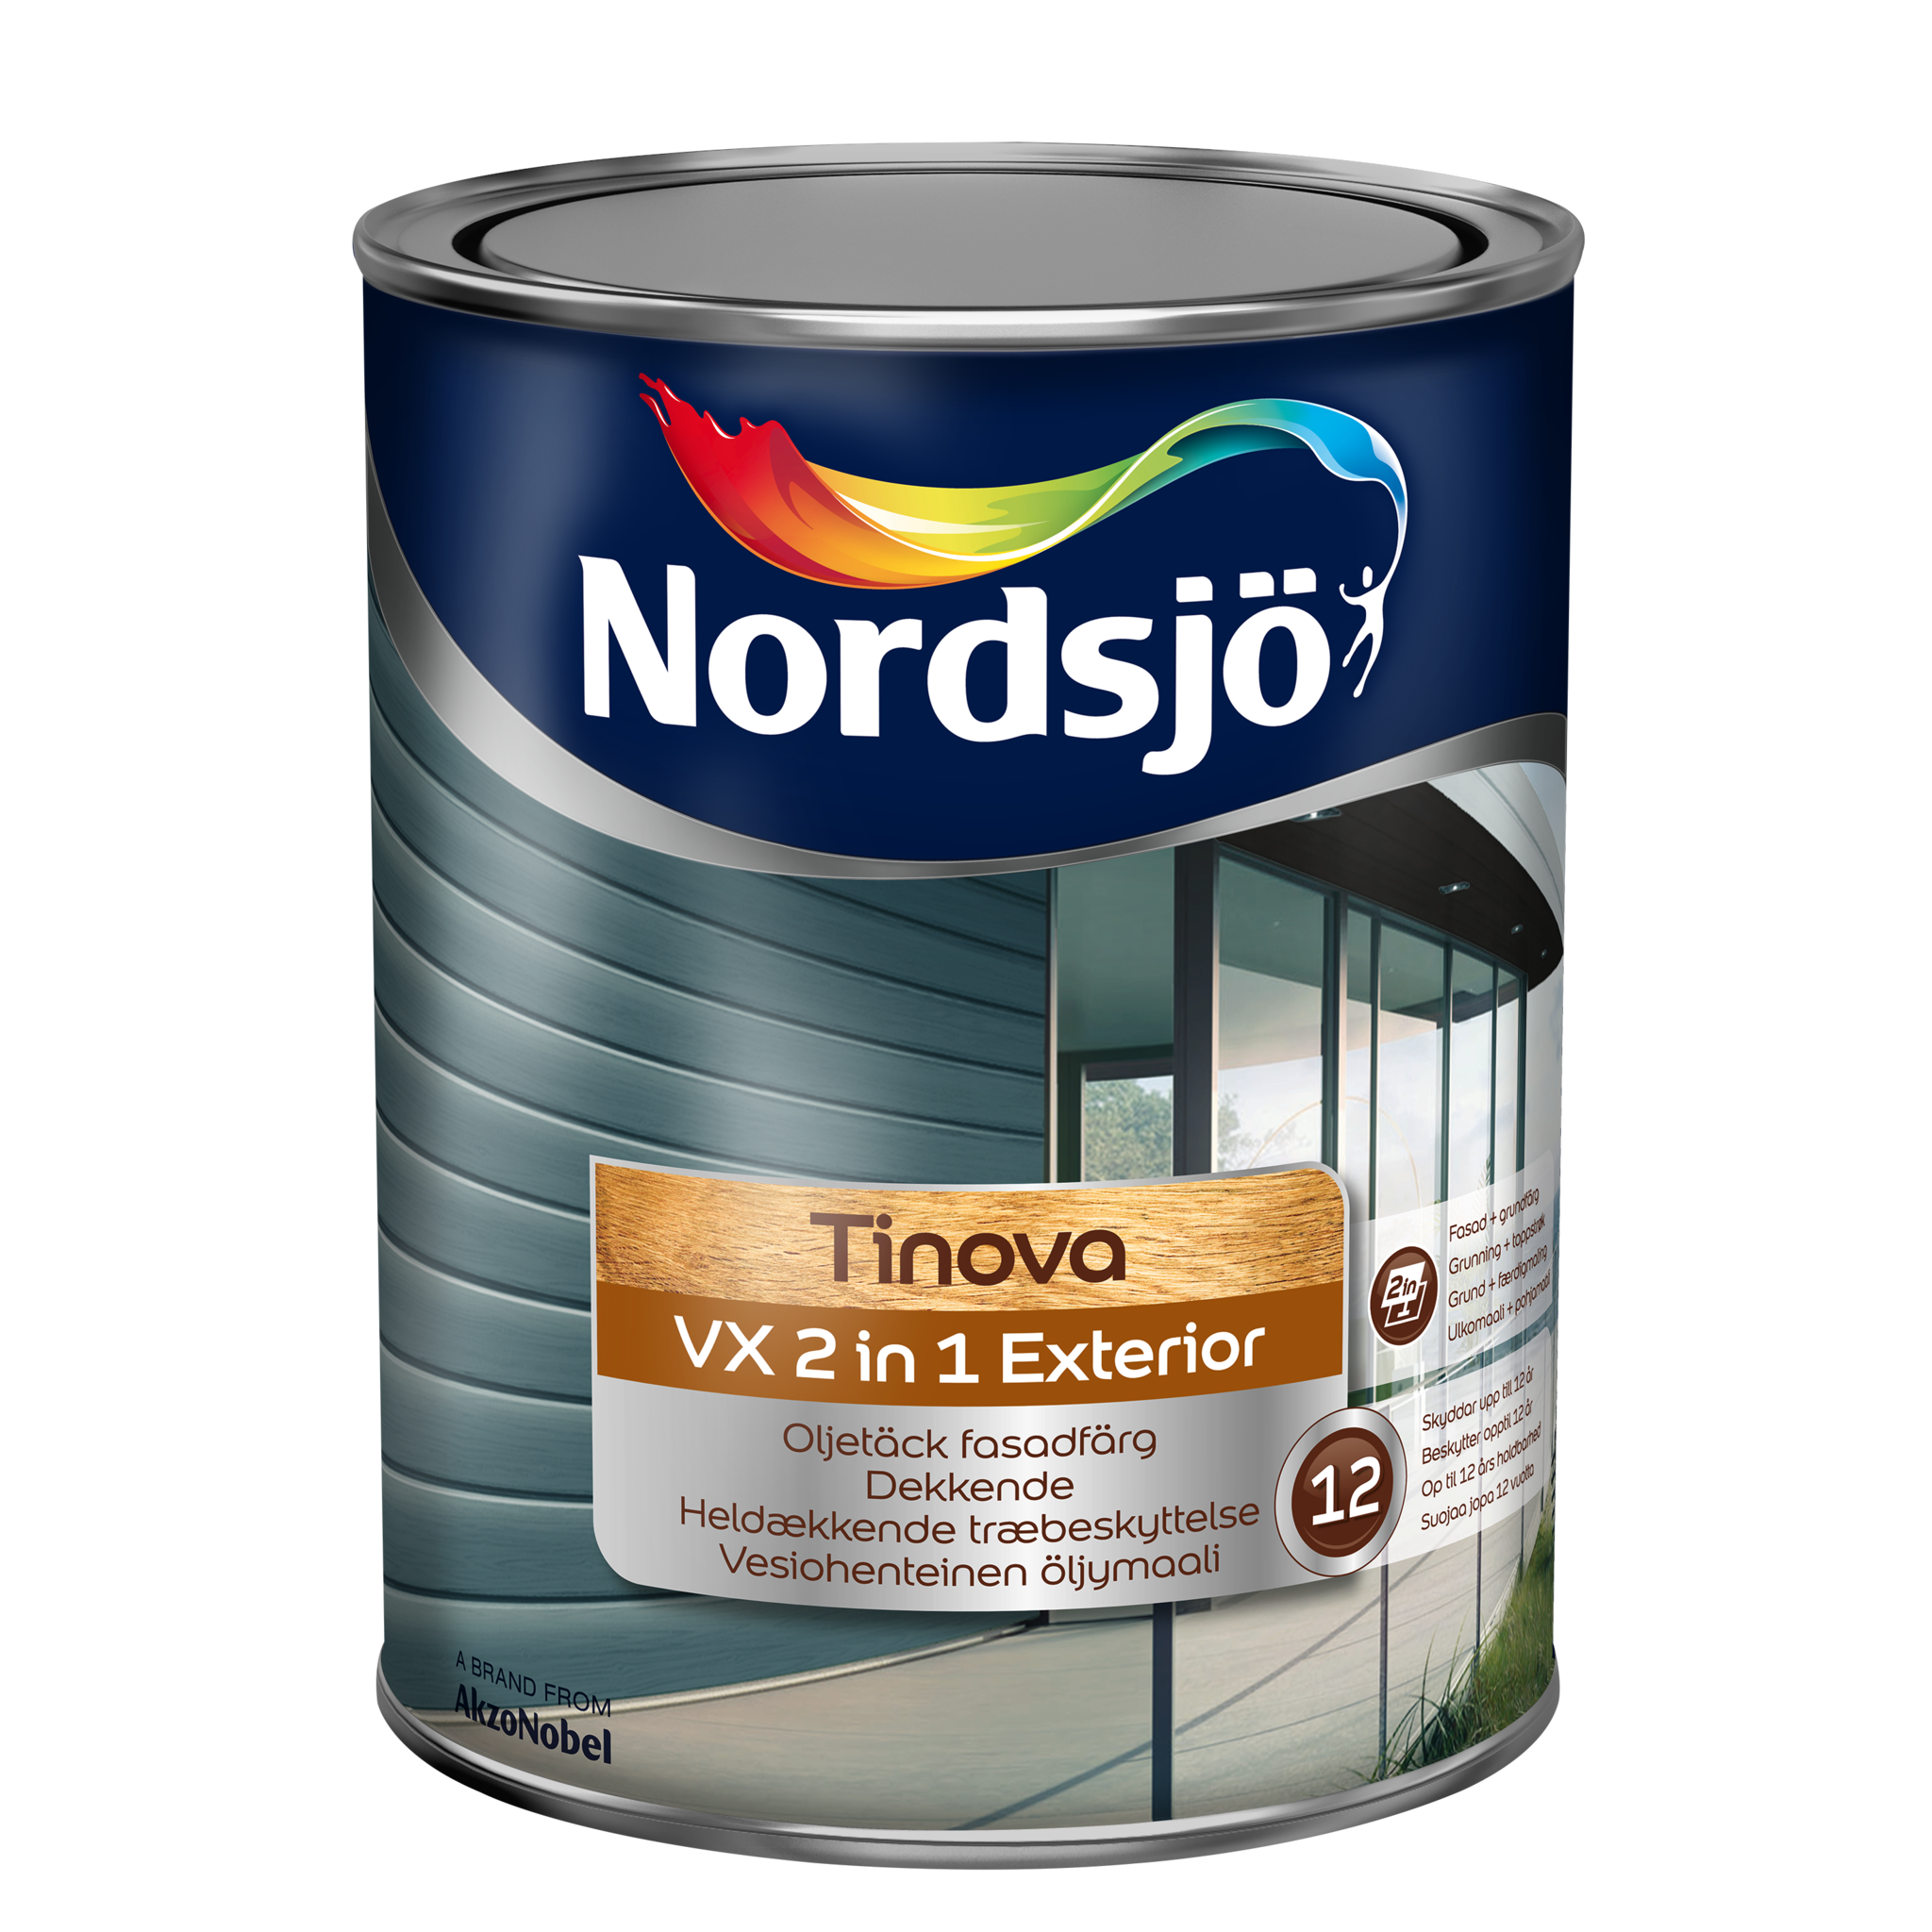 Nordsjö Tinova VX 2 in 1